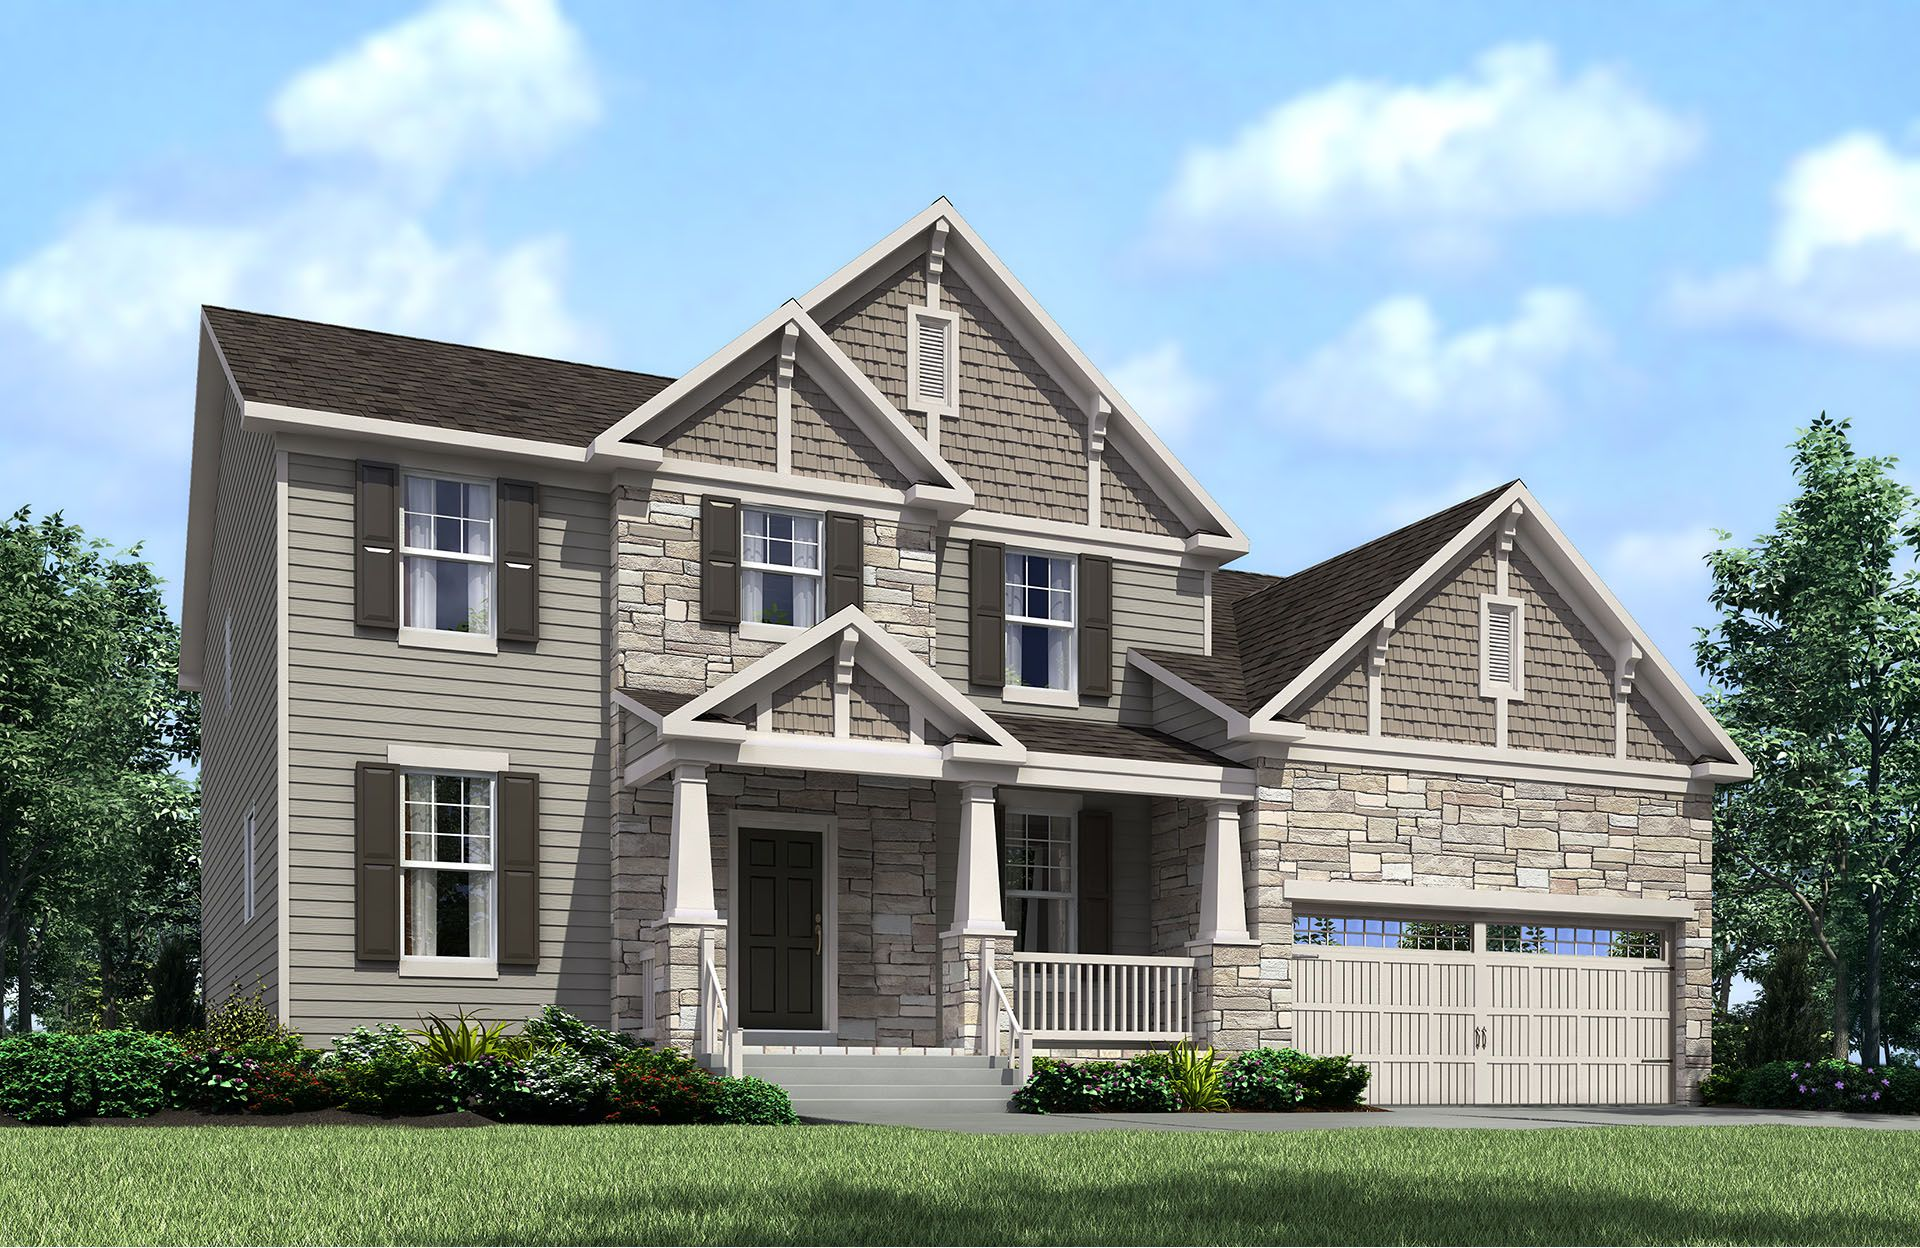 Real Estate at 1514 Village Grove Court, Hillsborough in Orange County, NC 27278